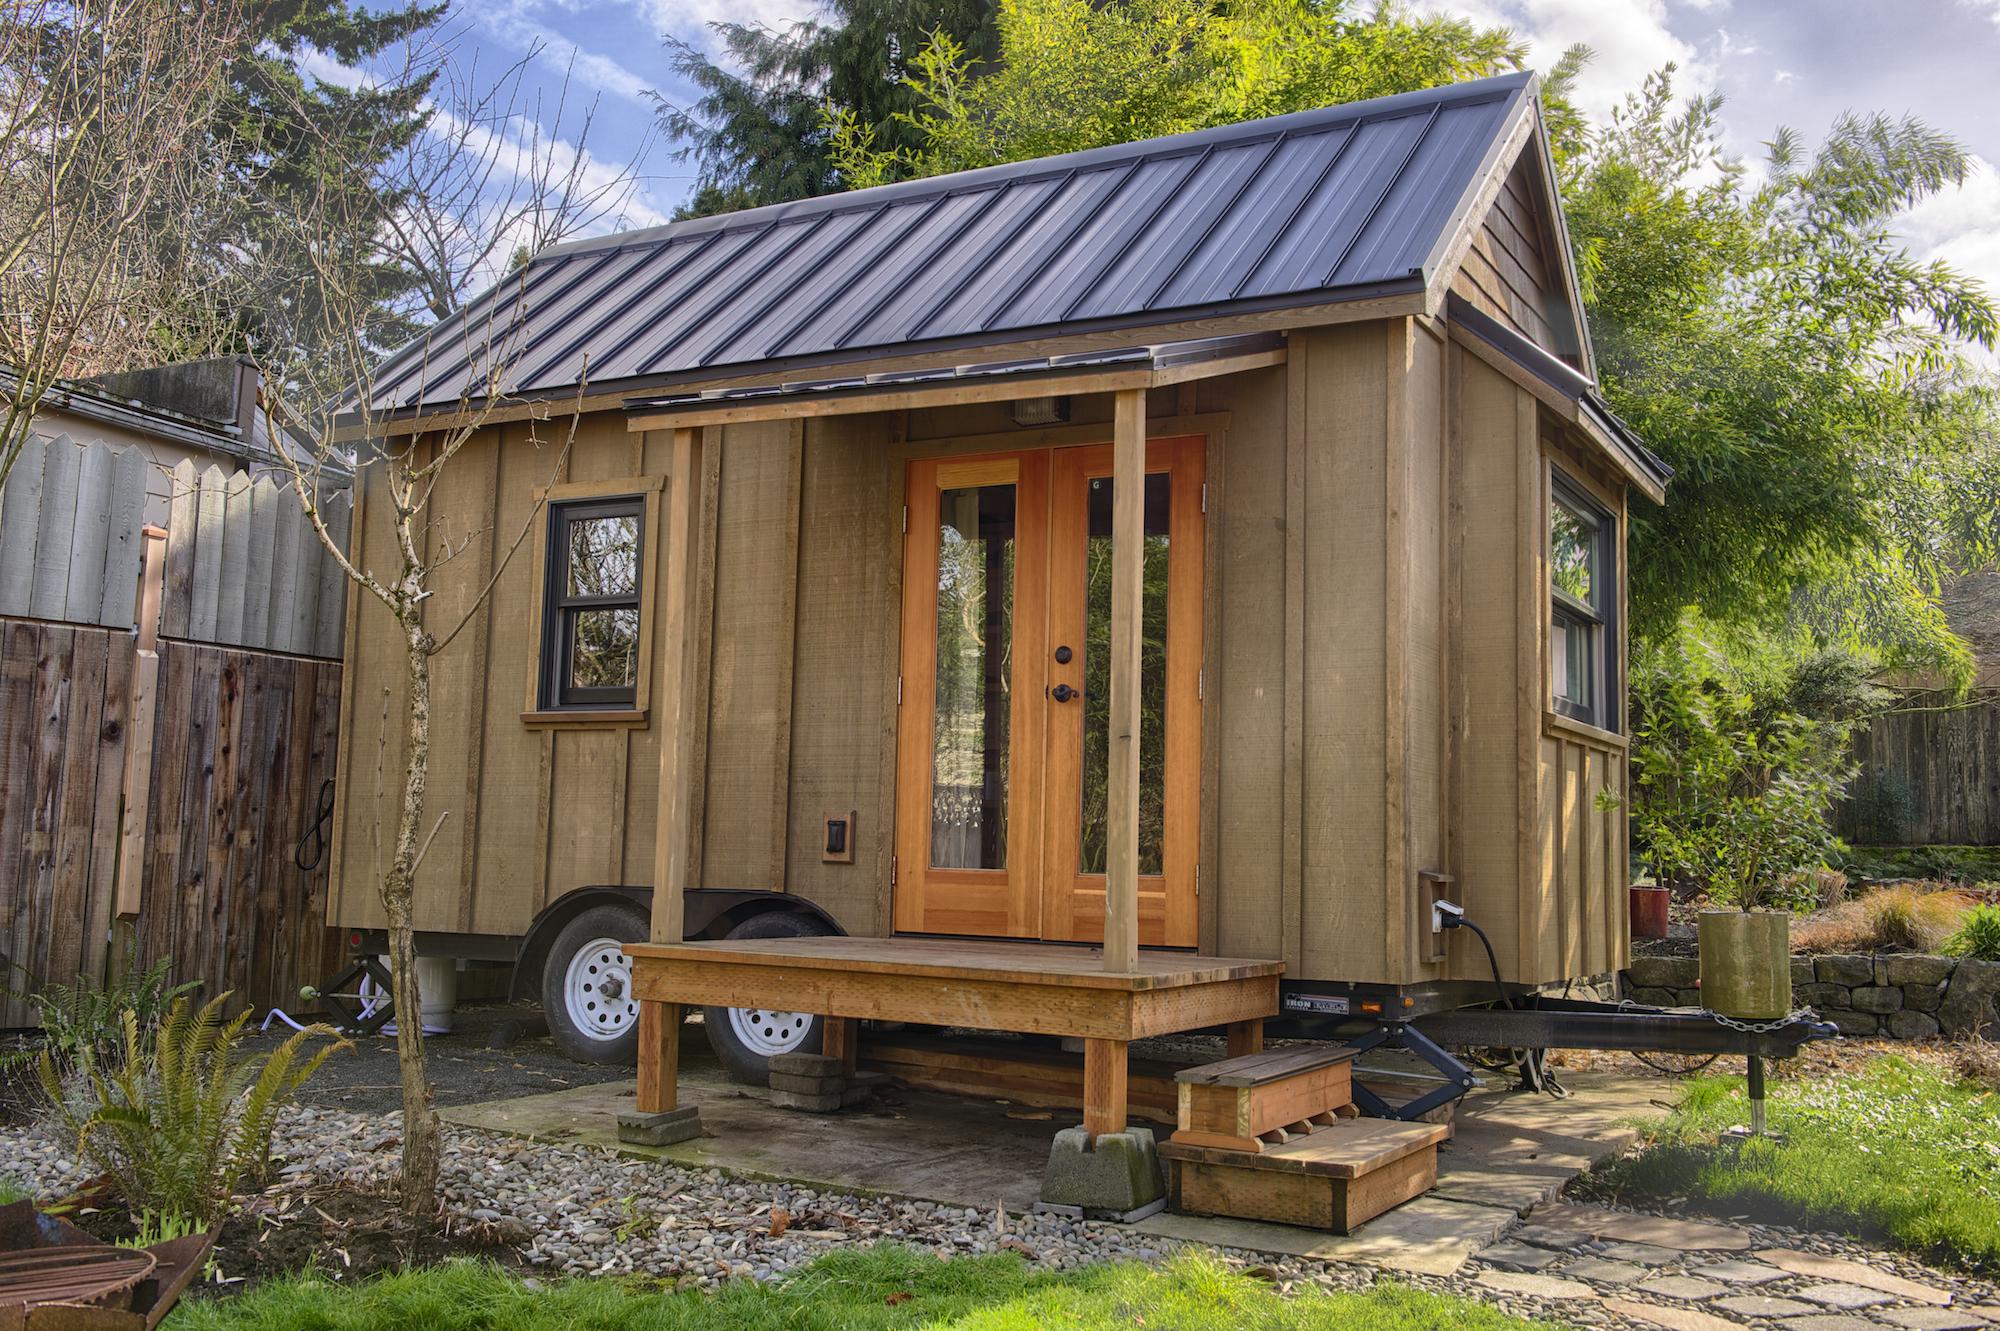 Gina's Tiny House at POD49   -Photo by Christopher Tack